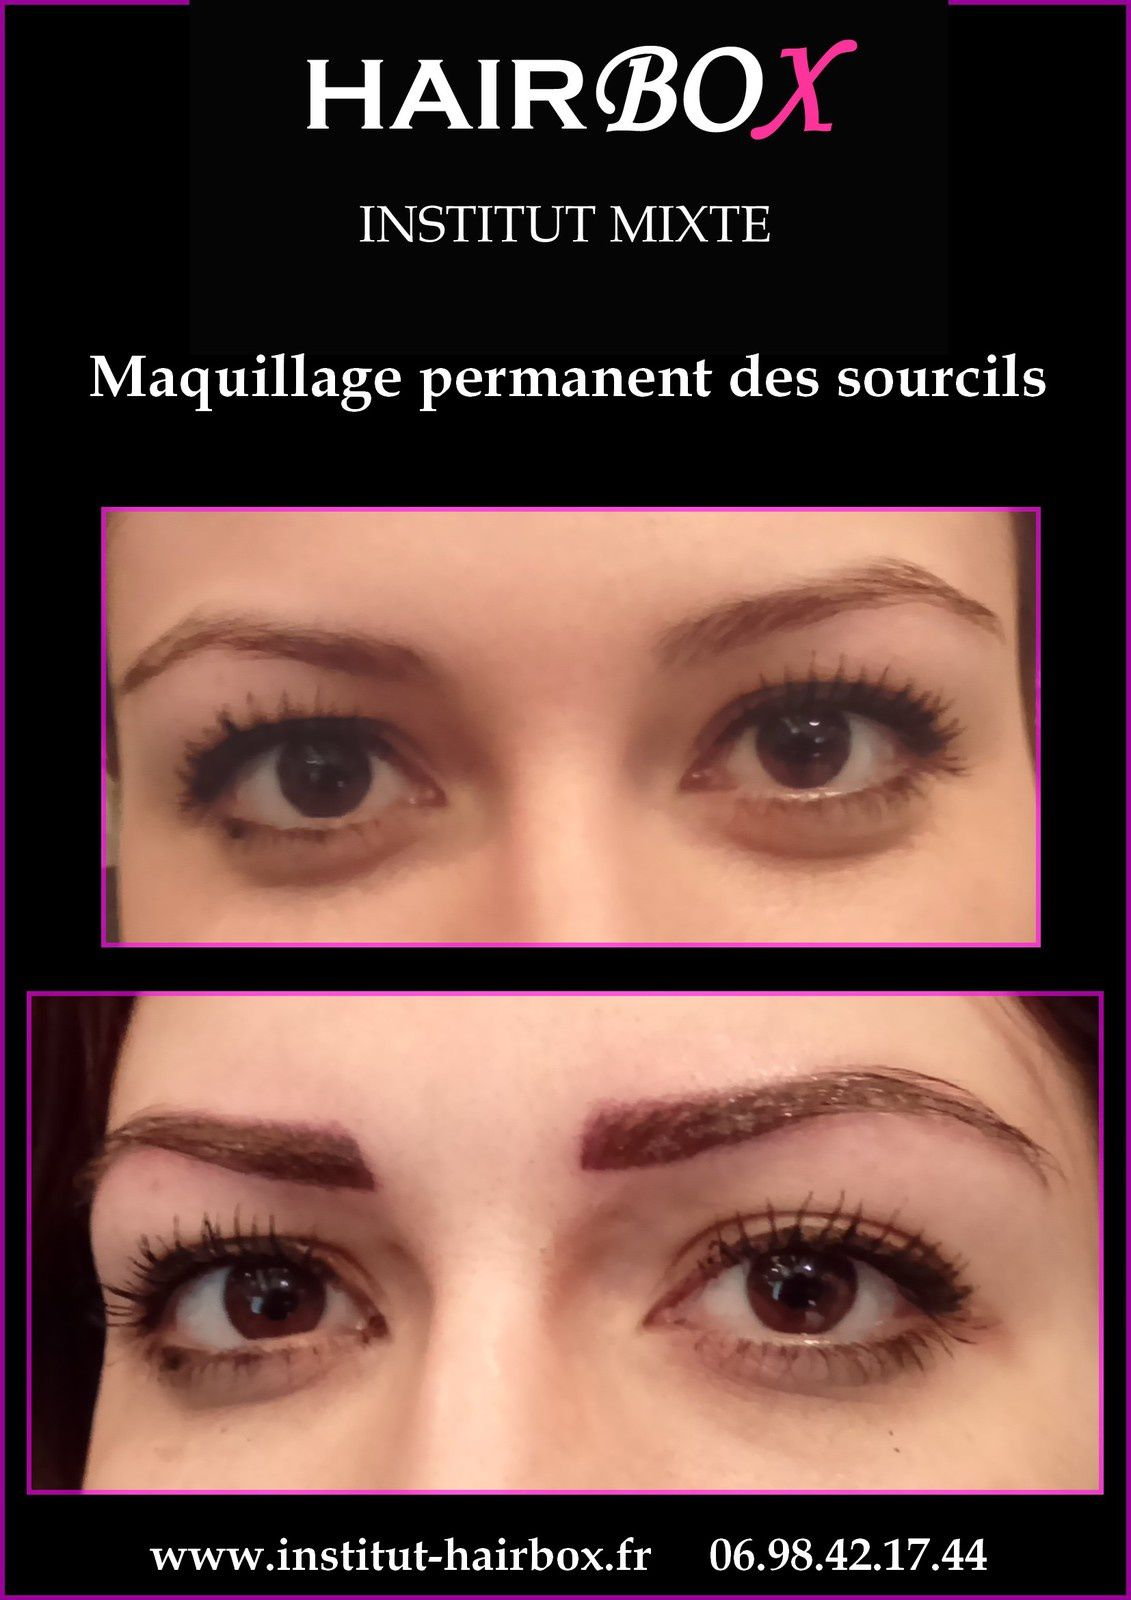 Maquillage semi permanent des sourcils aix